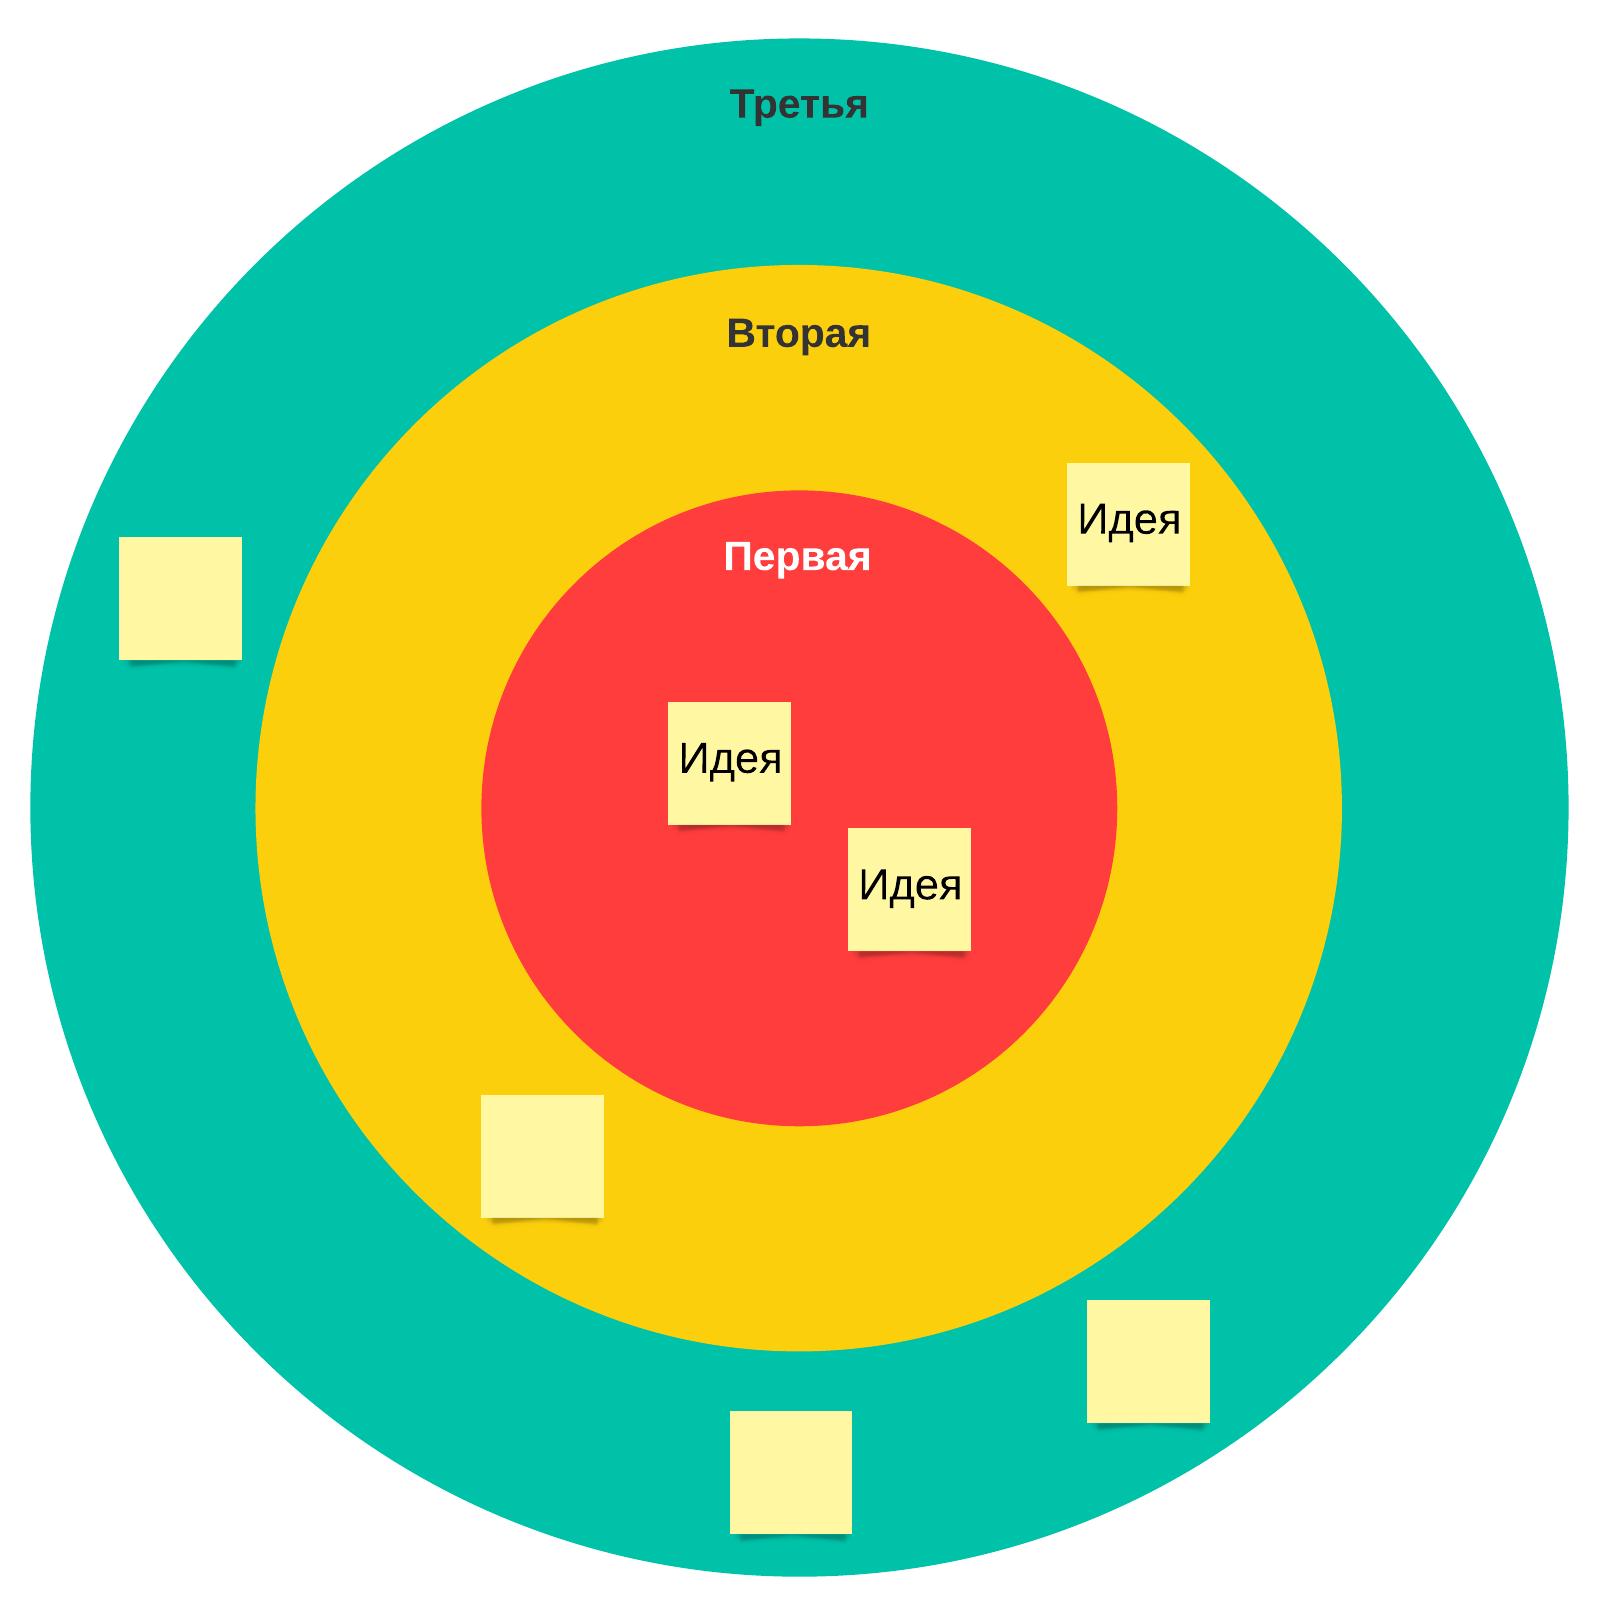 шаблон диаграммы-мишени